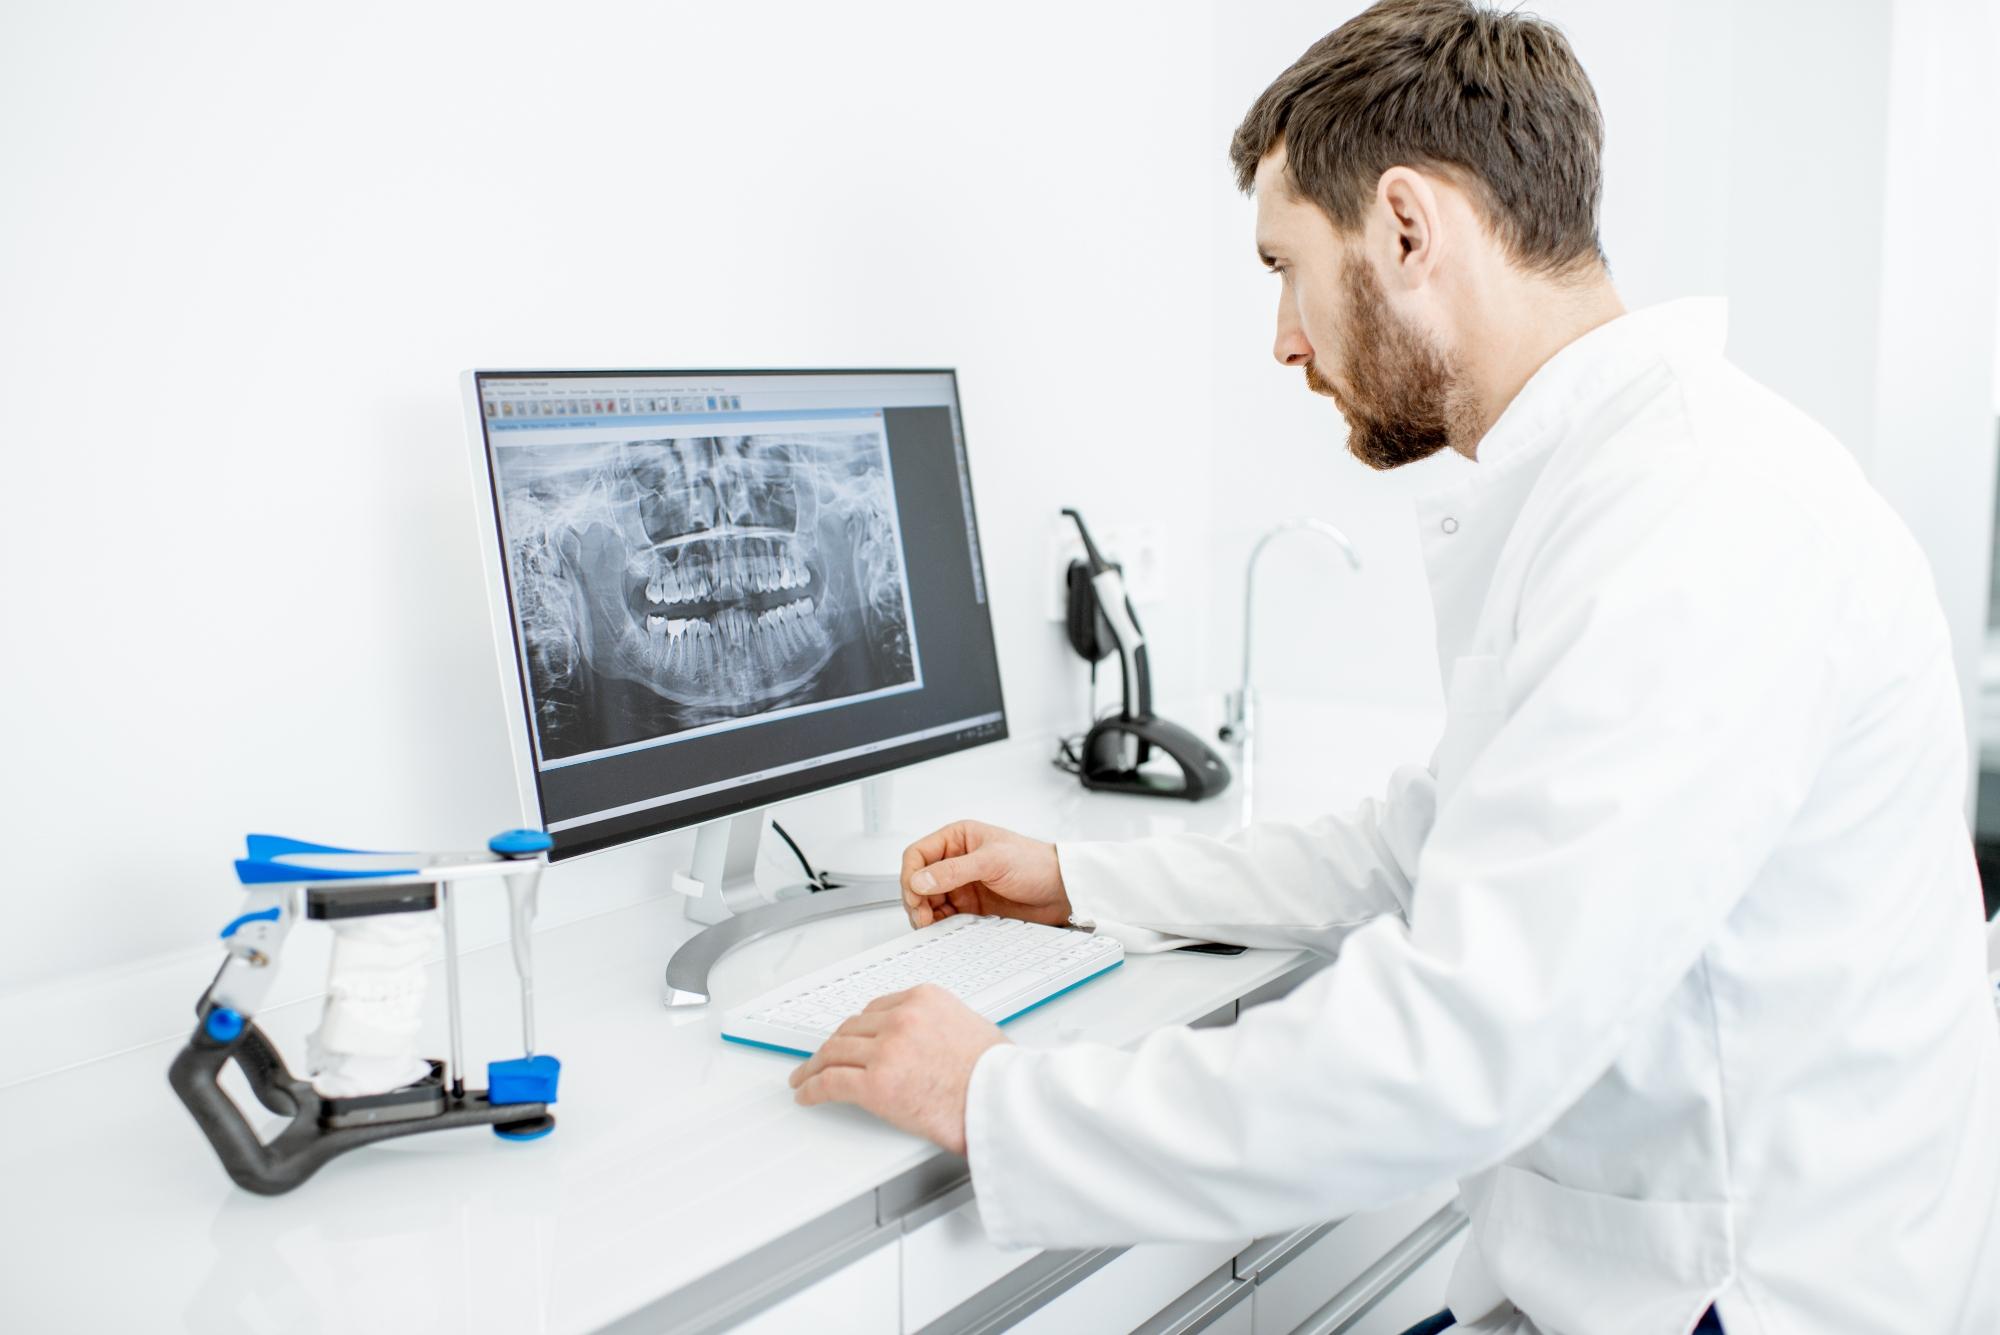 Dental software considerations2